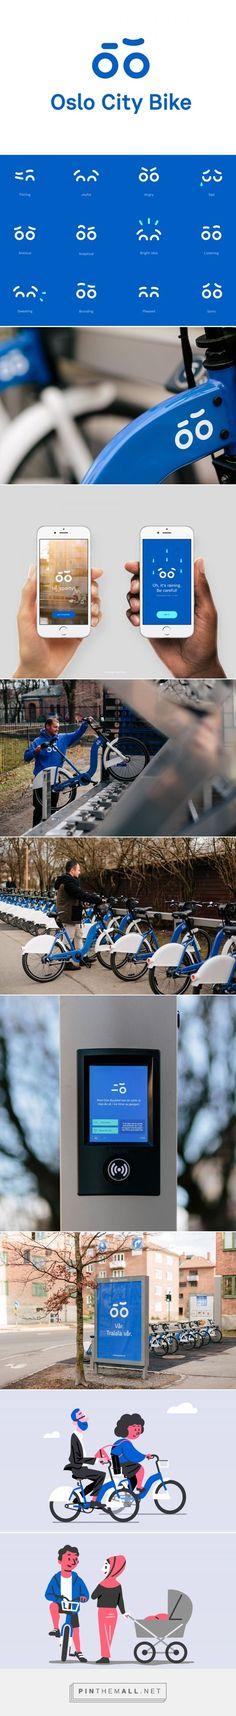 Las bicicletas públicas de Oslo estrenan imagen corporativa | Brandemia_... - a grouped images picture - Pin Them All. If you like UX, design, or design thinking, check out theuxblog.com